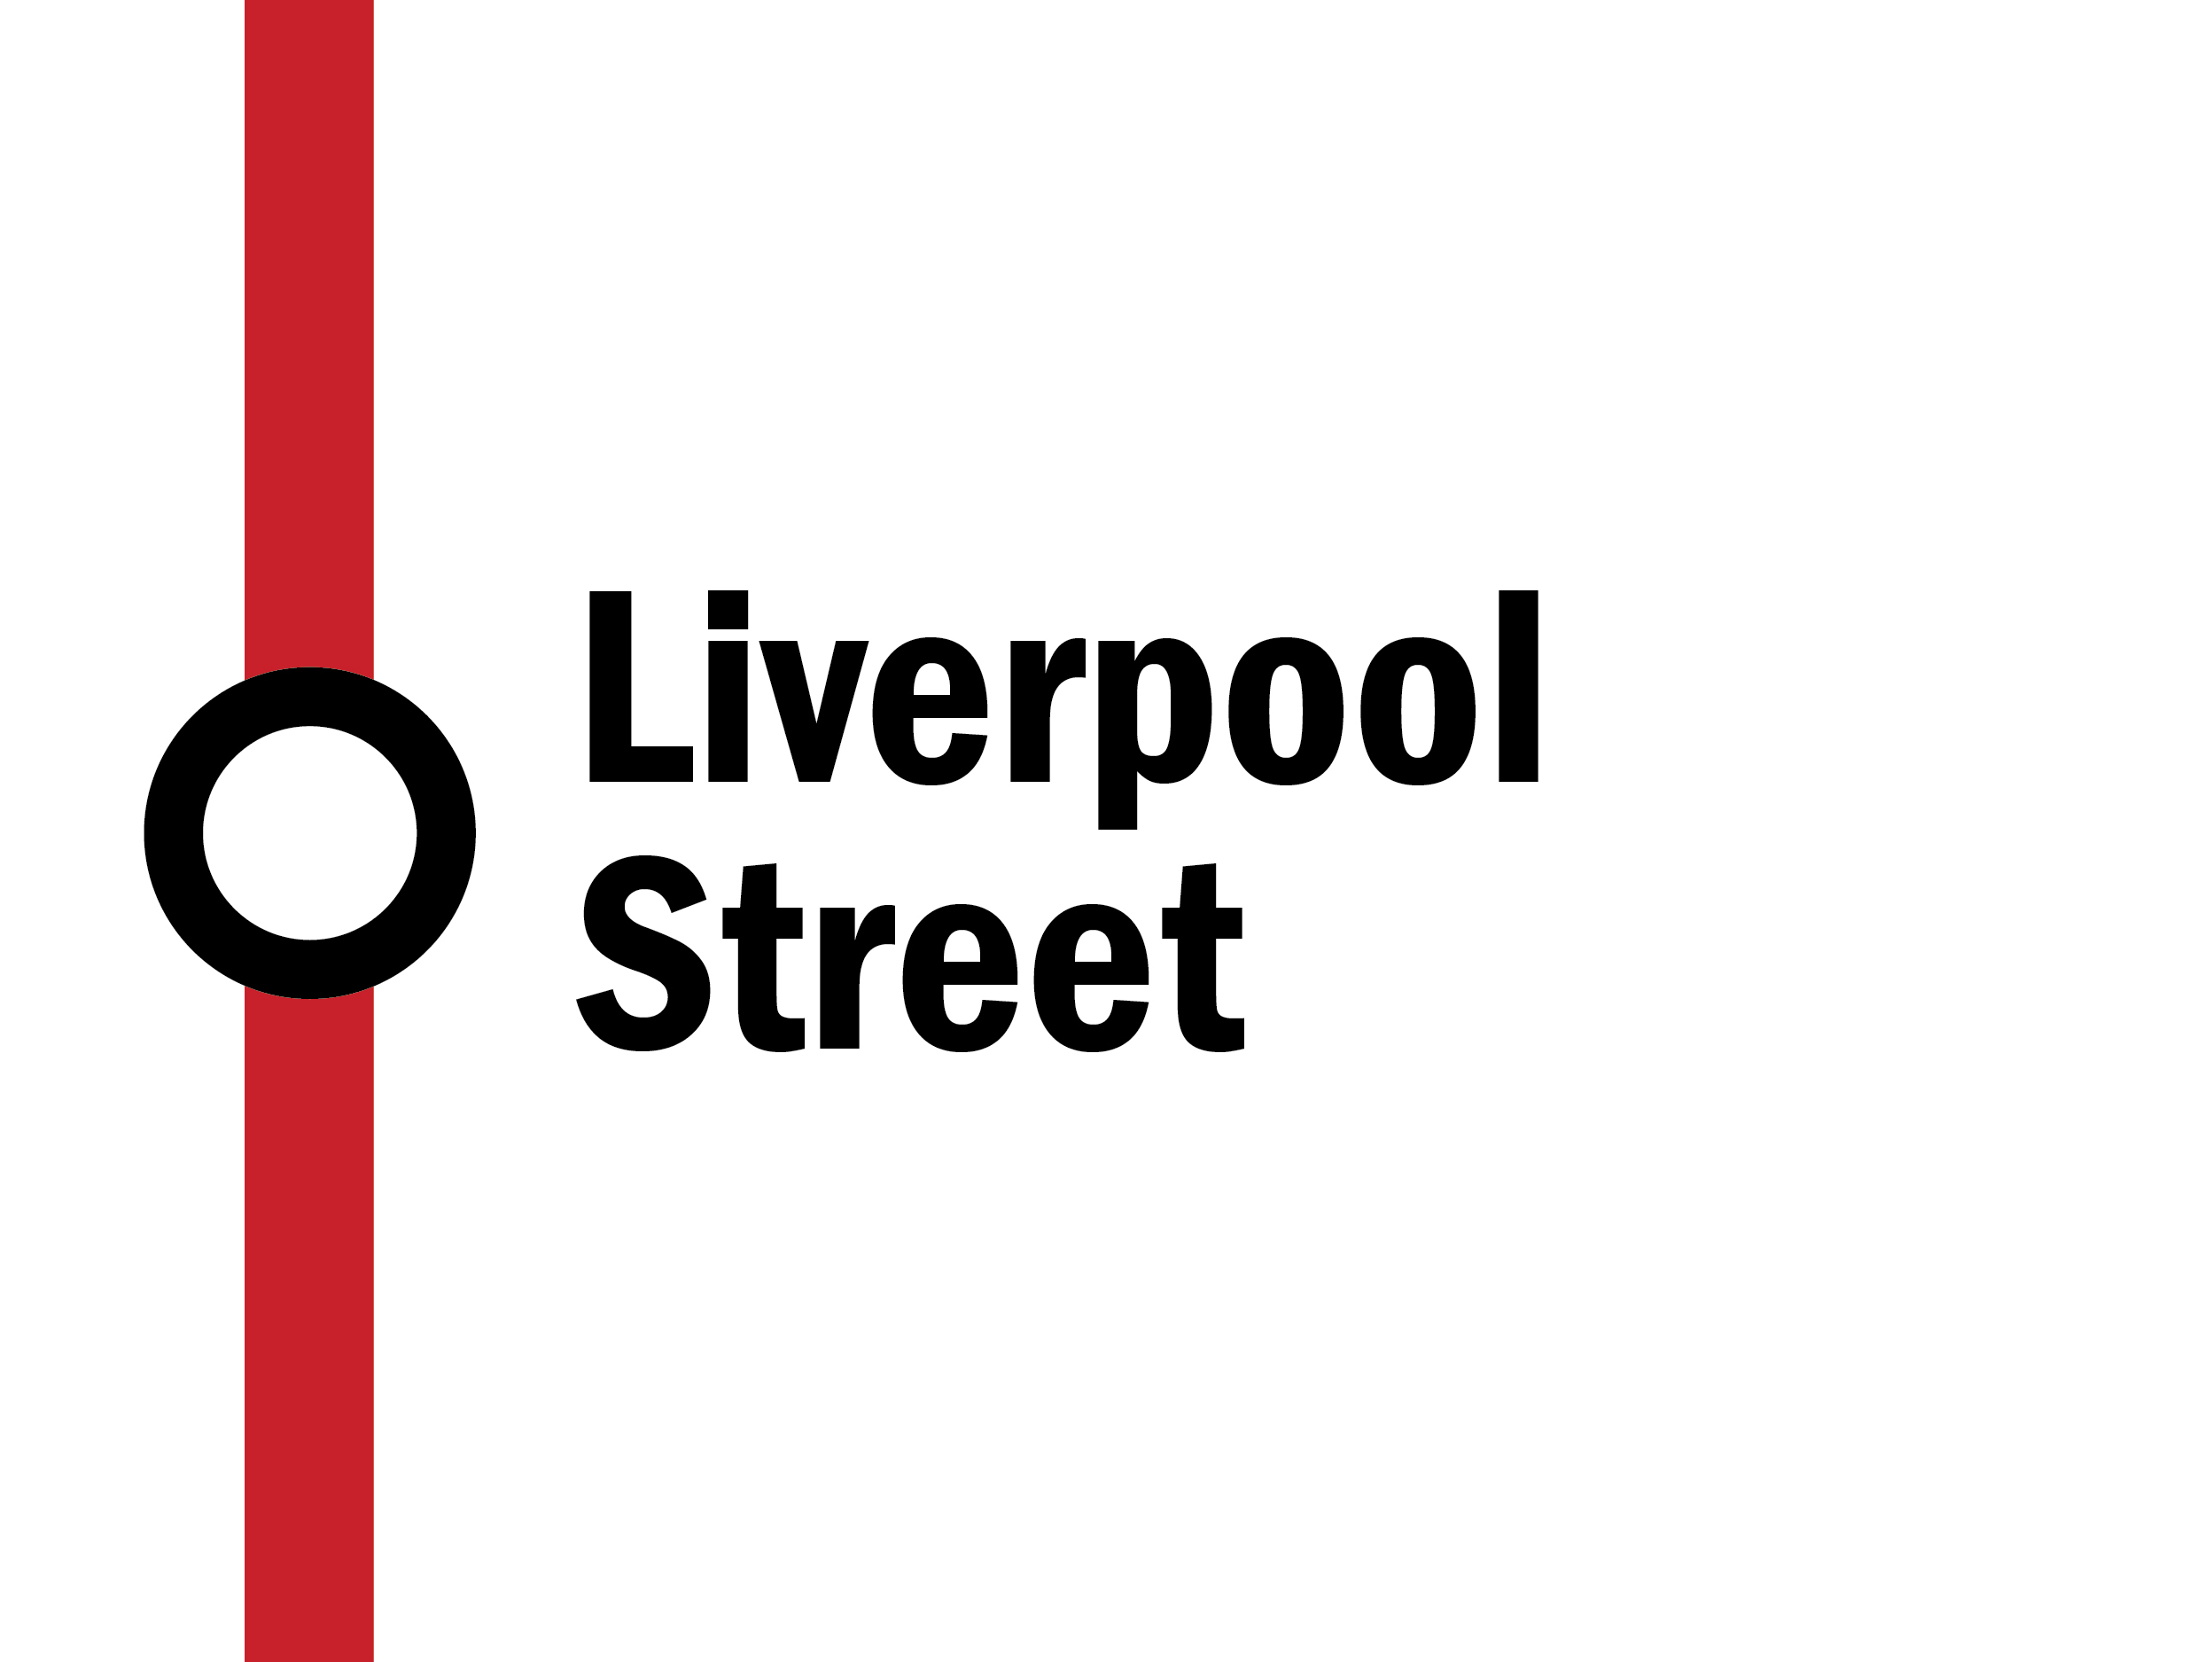 Night tube: Liverpool Street